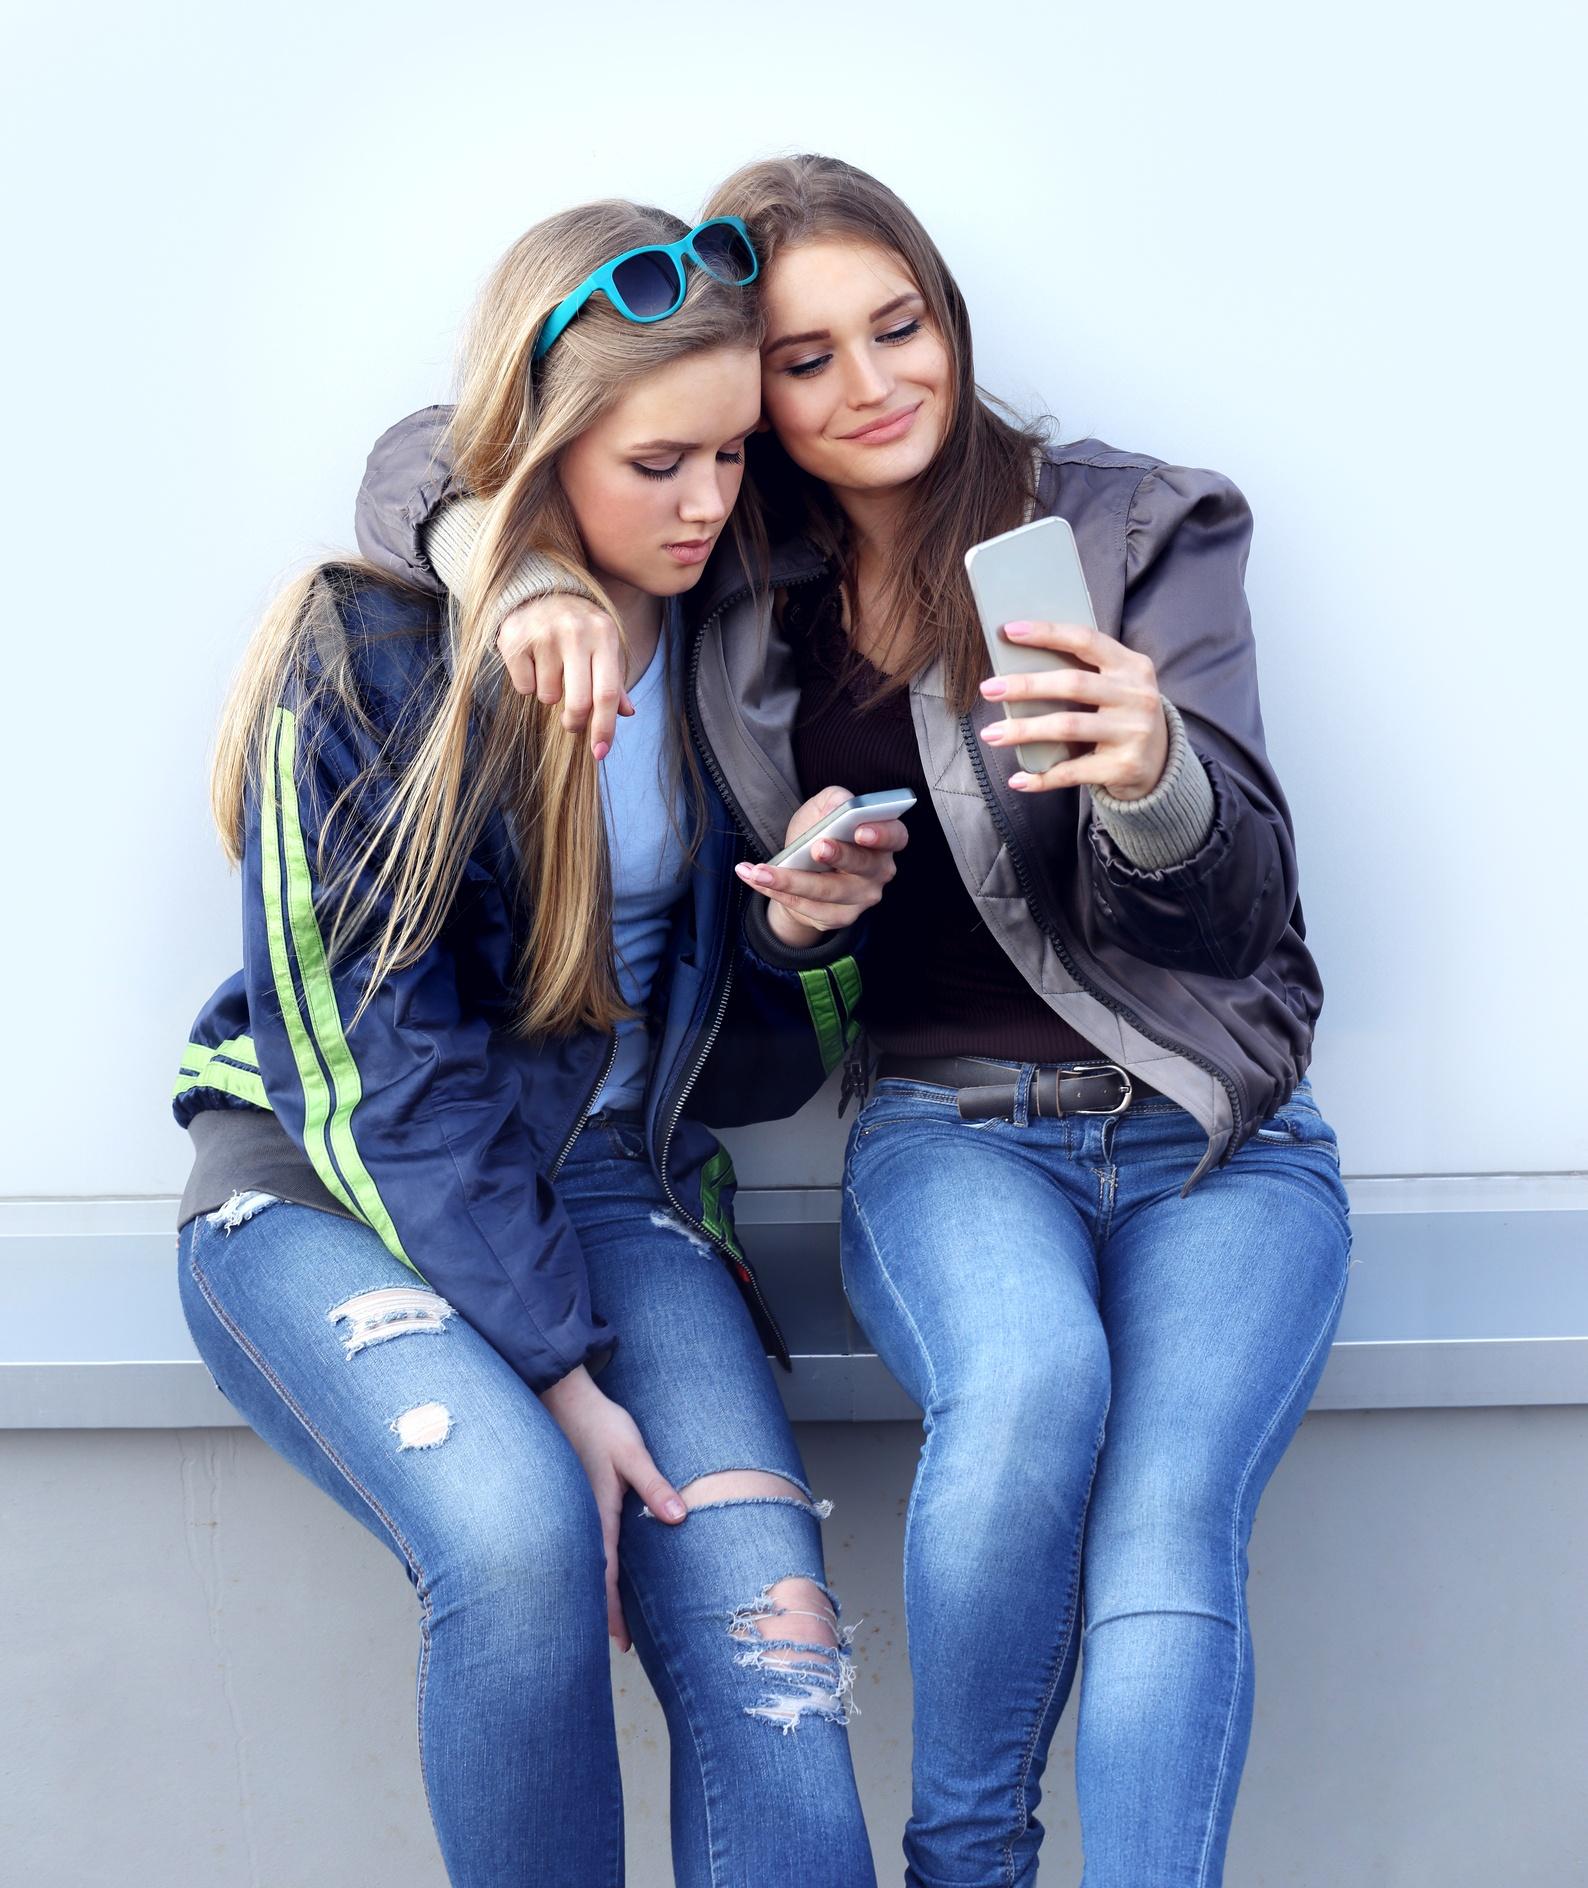 Selfie closeup of two friends